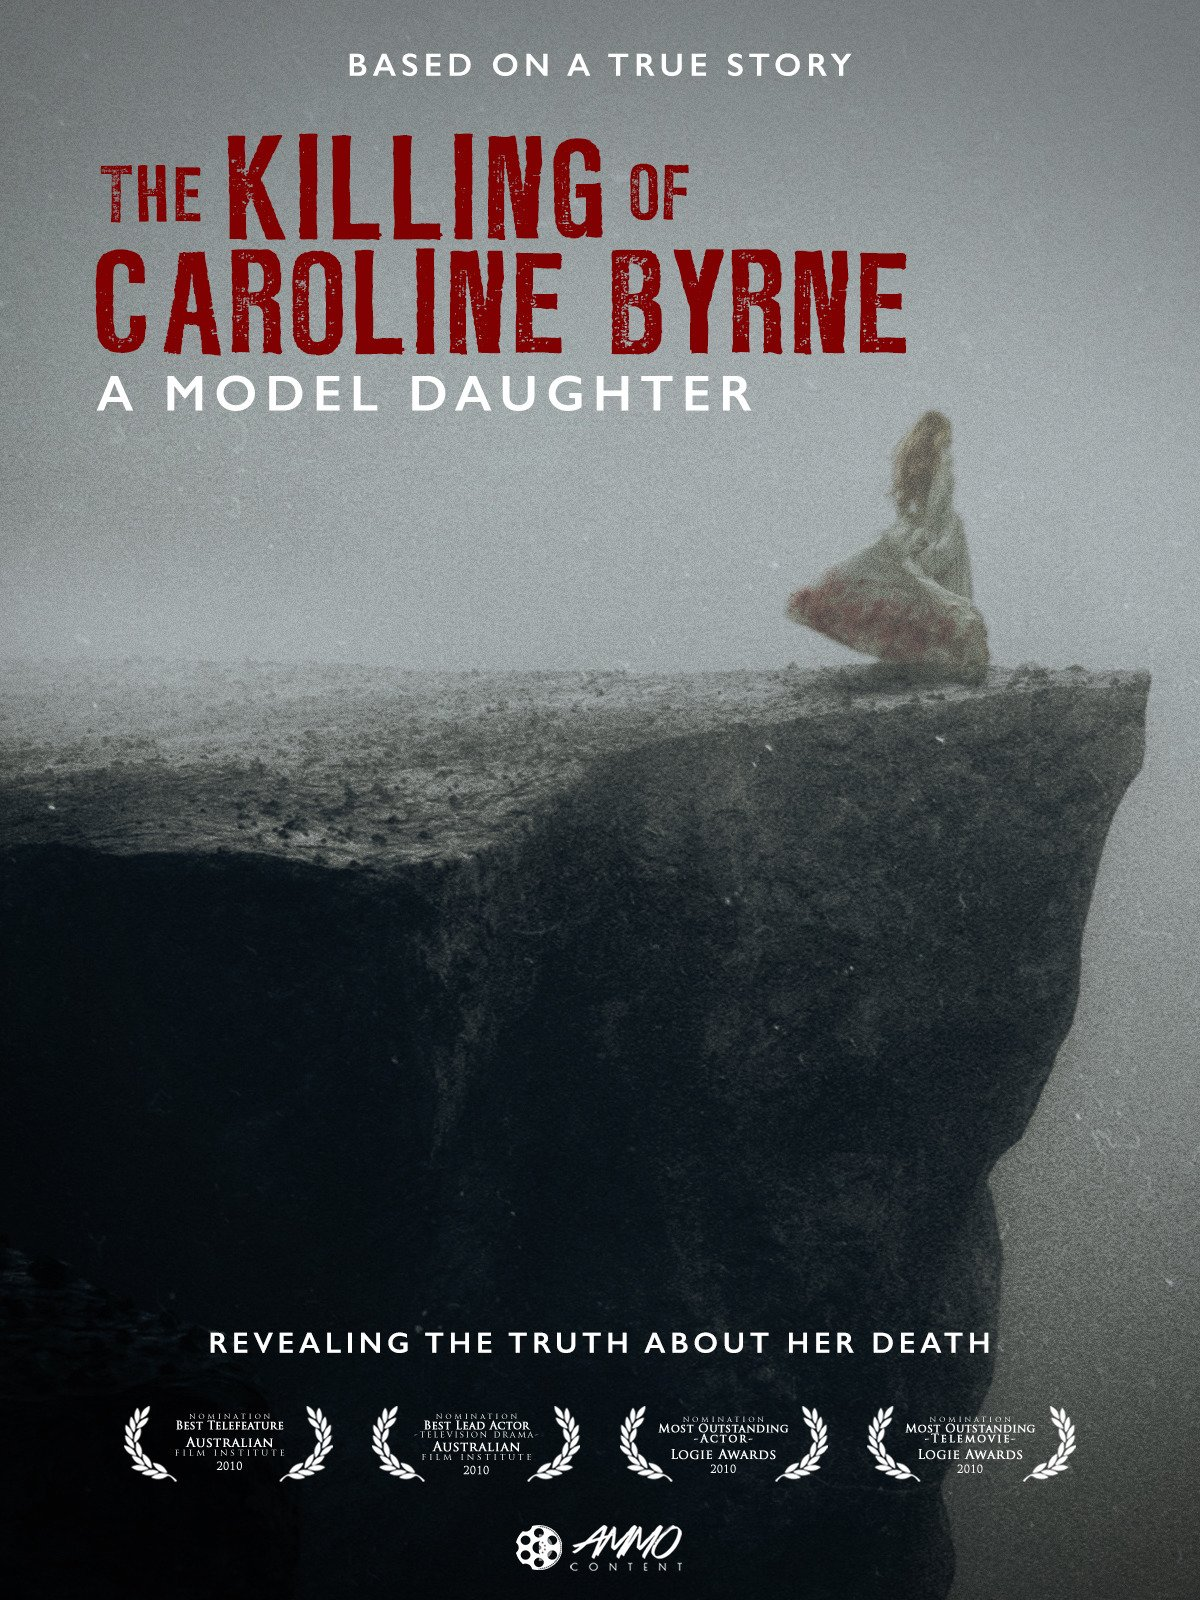 A Model Daughter: The Killing Of Caroline Byre